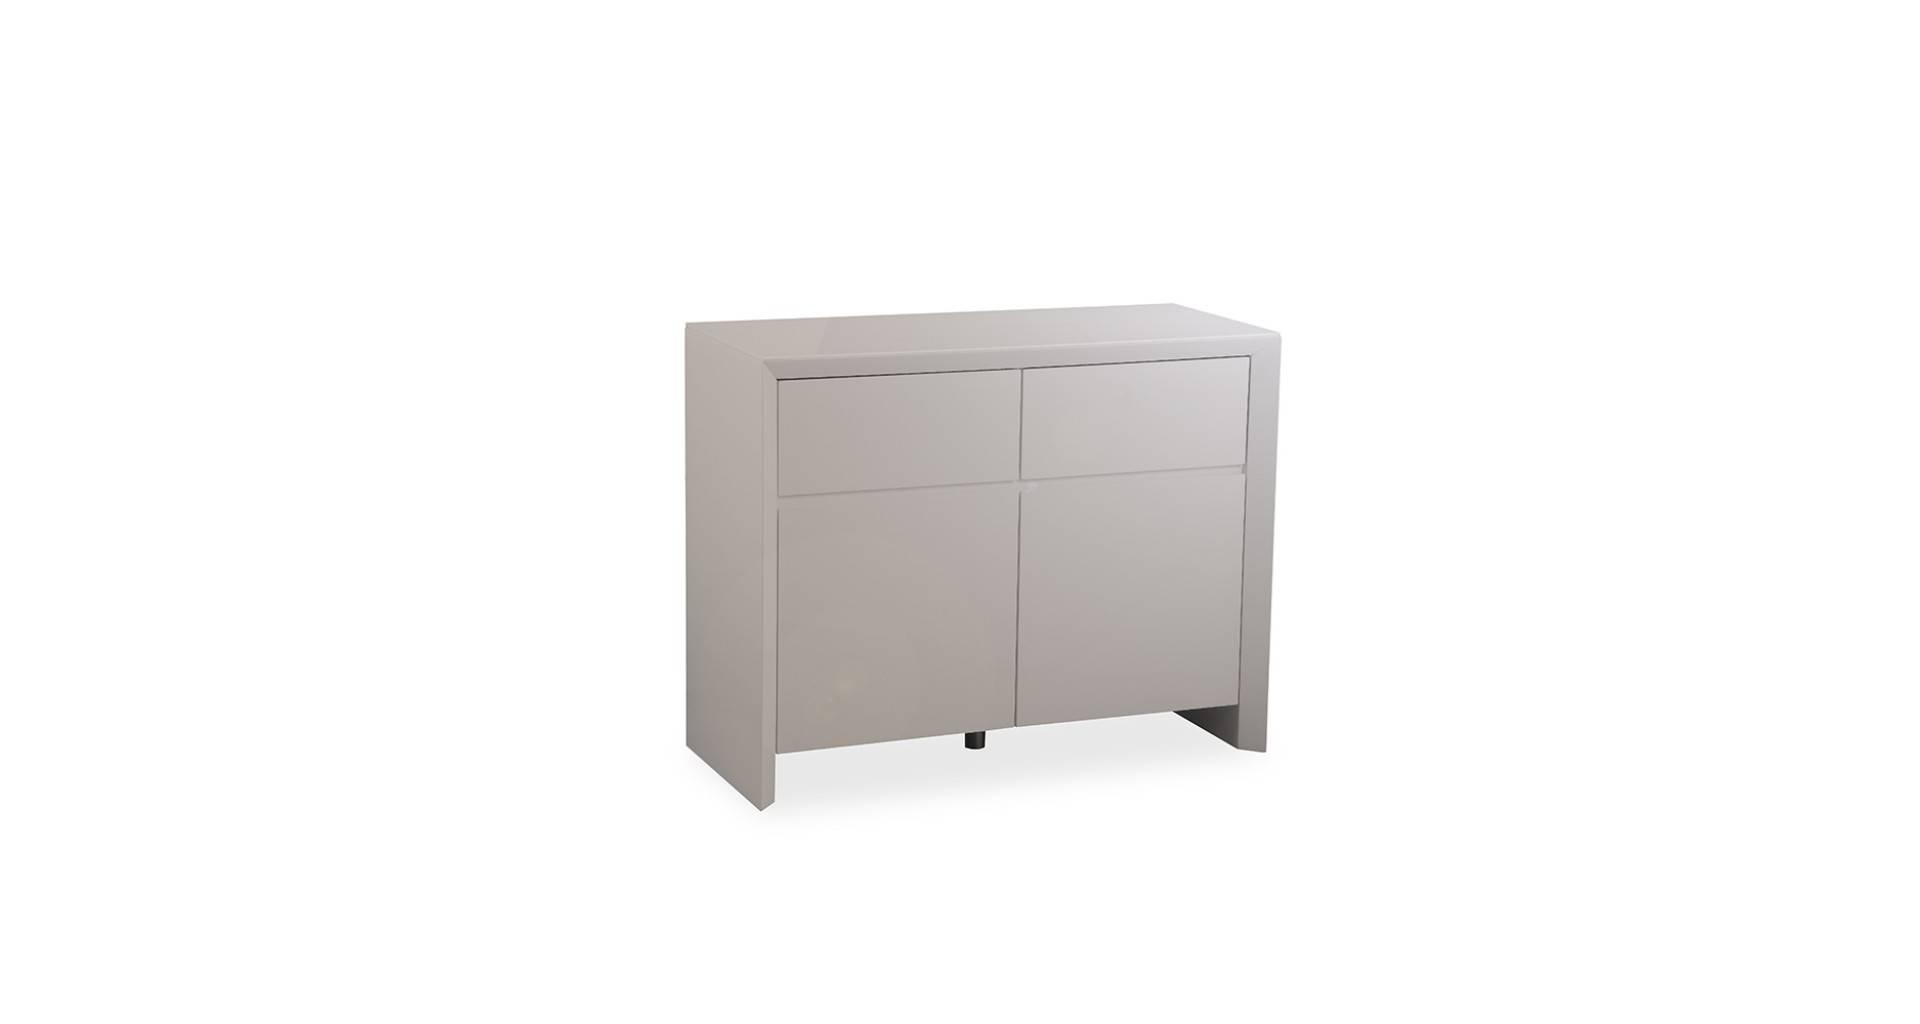 Soho – Small Sideboard – Grey High Gloss With Regard To Current High Gloss Grey Sideboards (View 8 of 15)